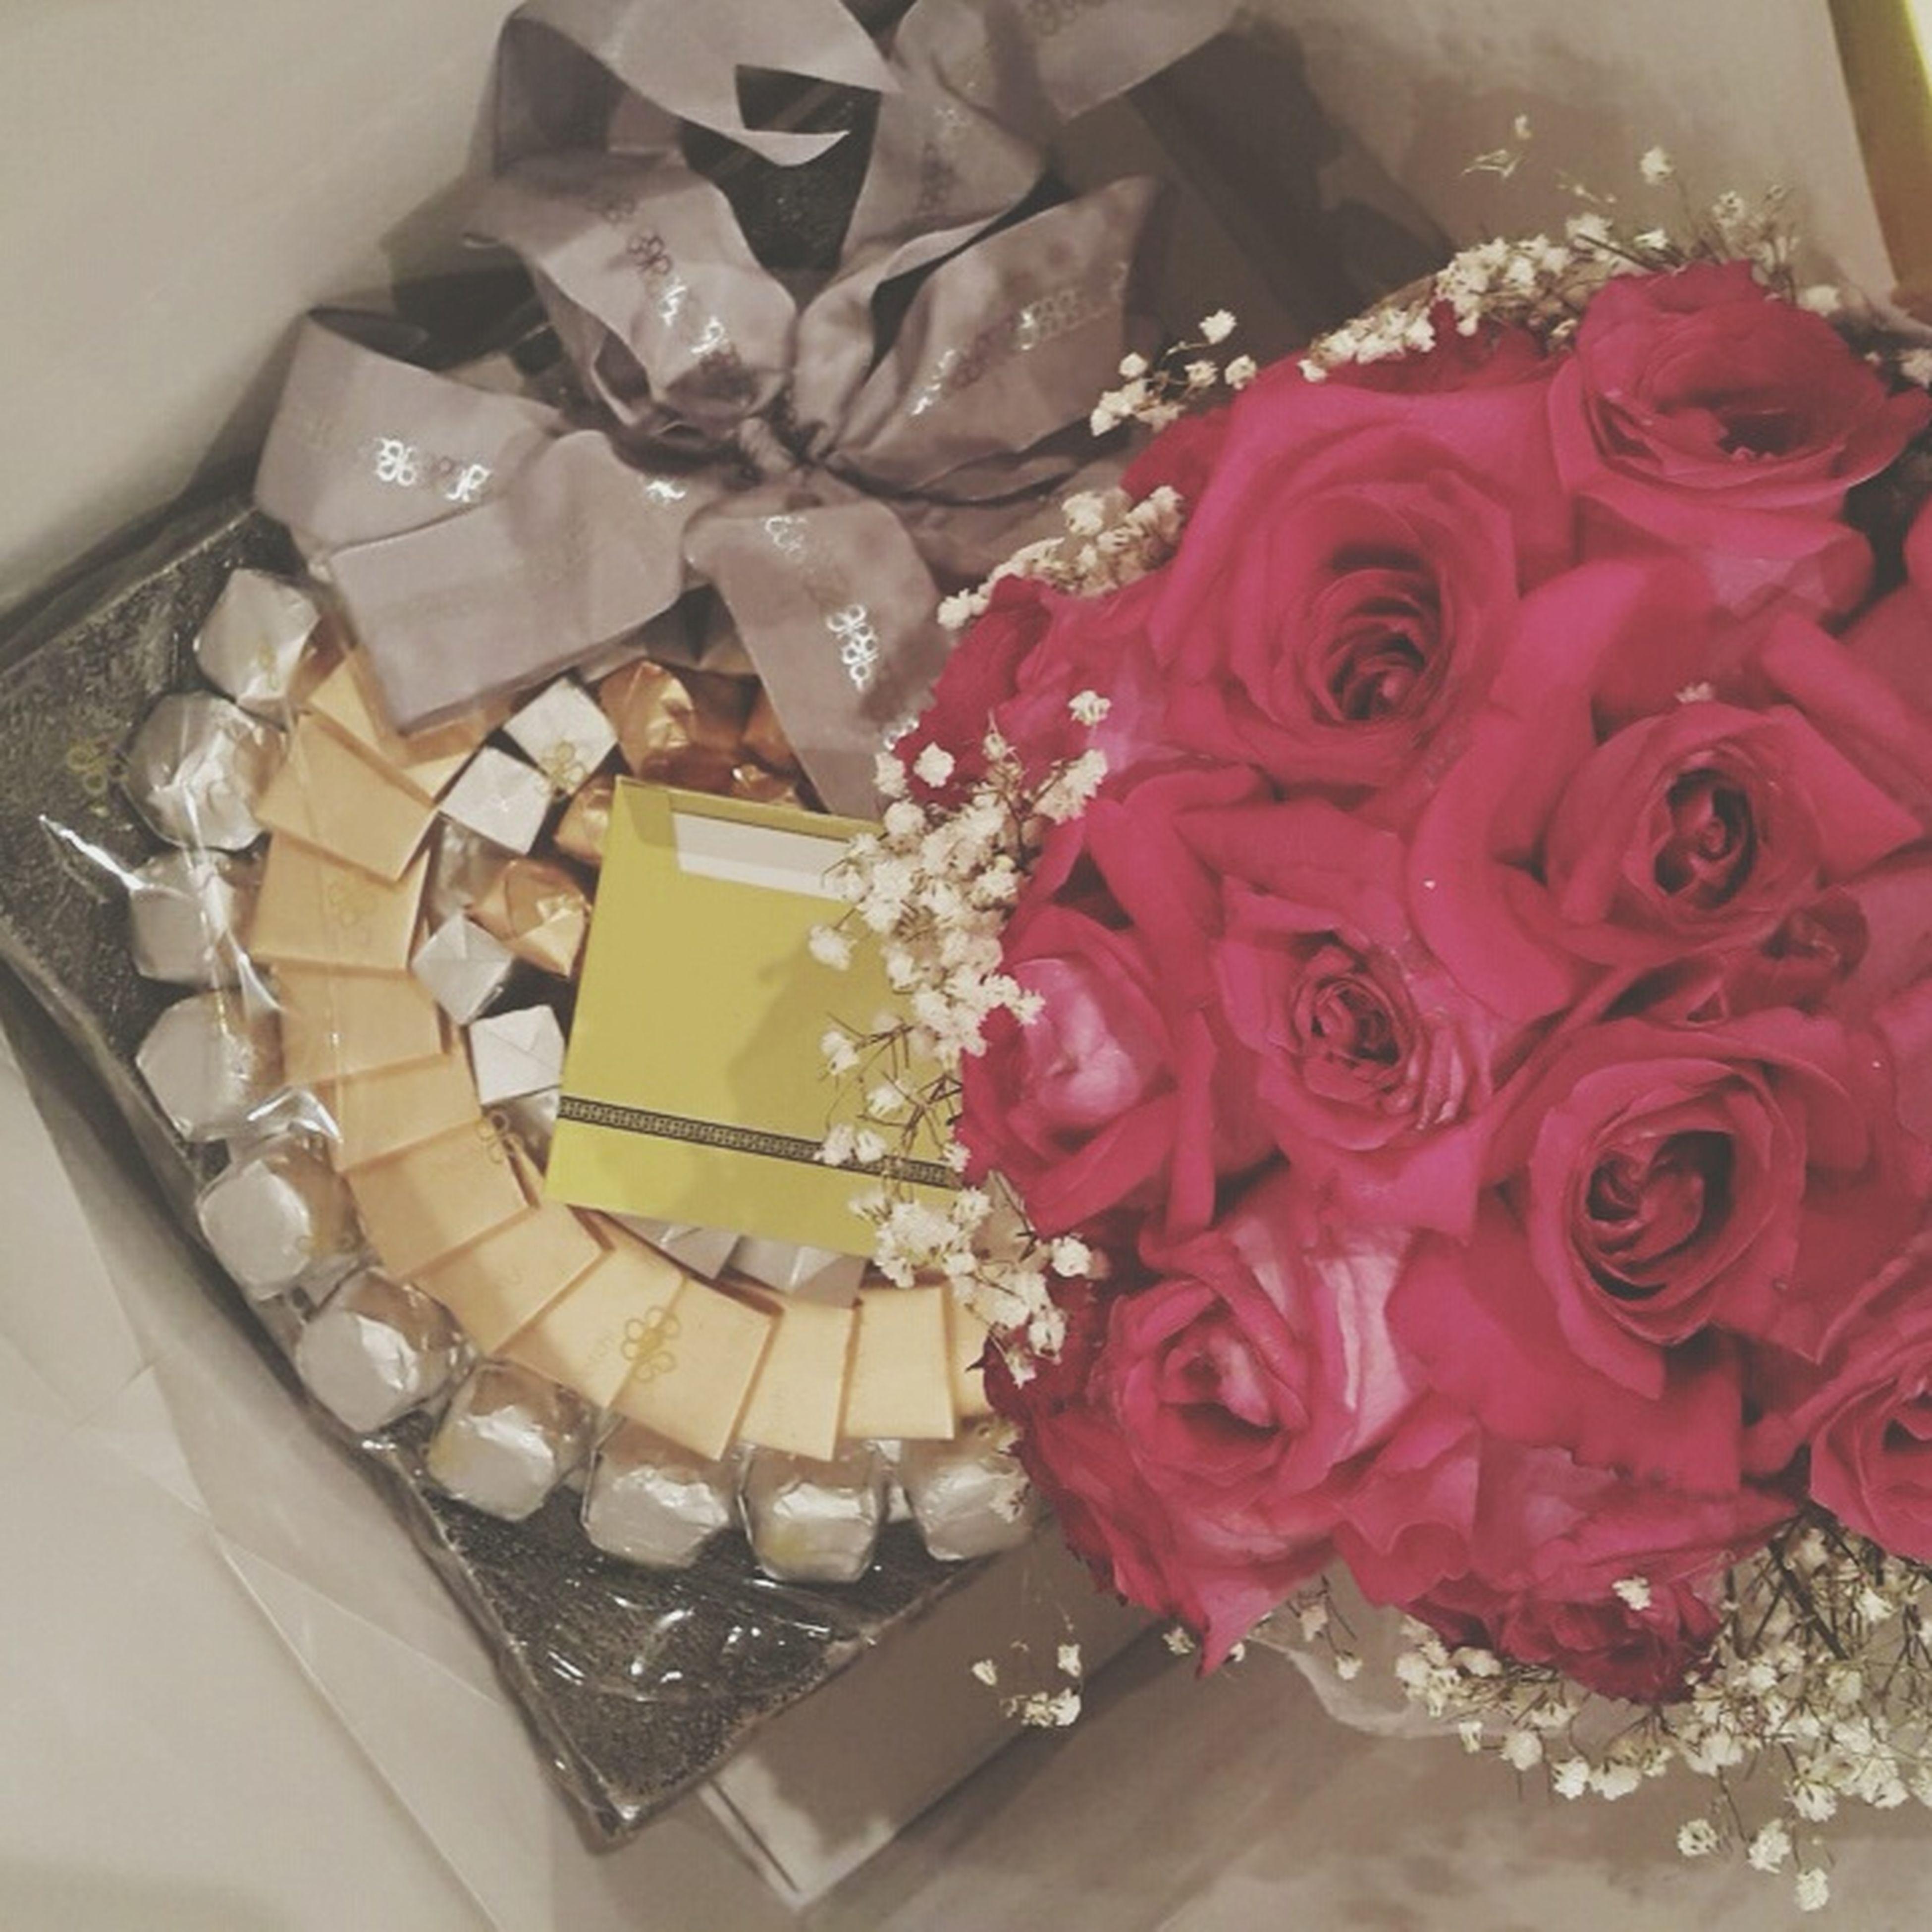 indoors, flower, still life, decoration, close-up, table, rose - flower, freshness, high angle view, pink color, sweet food, home interior, celebration, vase, red, no people, dessert, bouquet, cake, petal